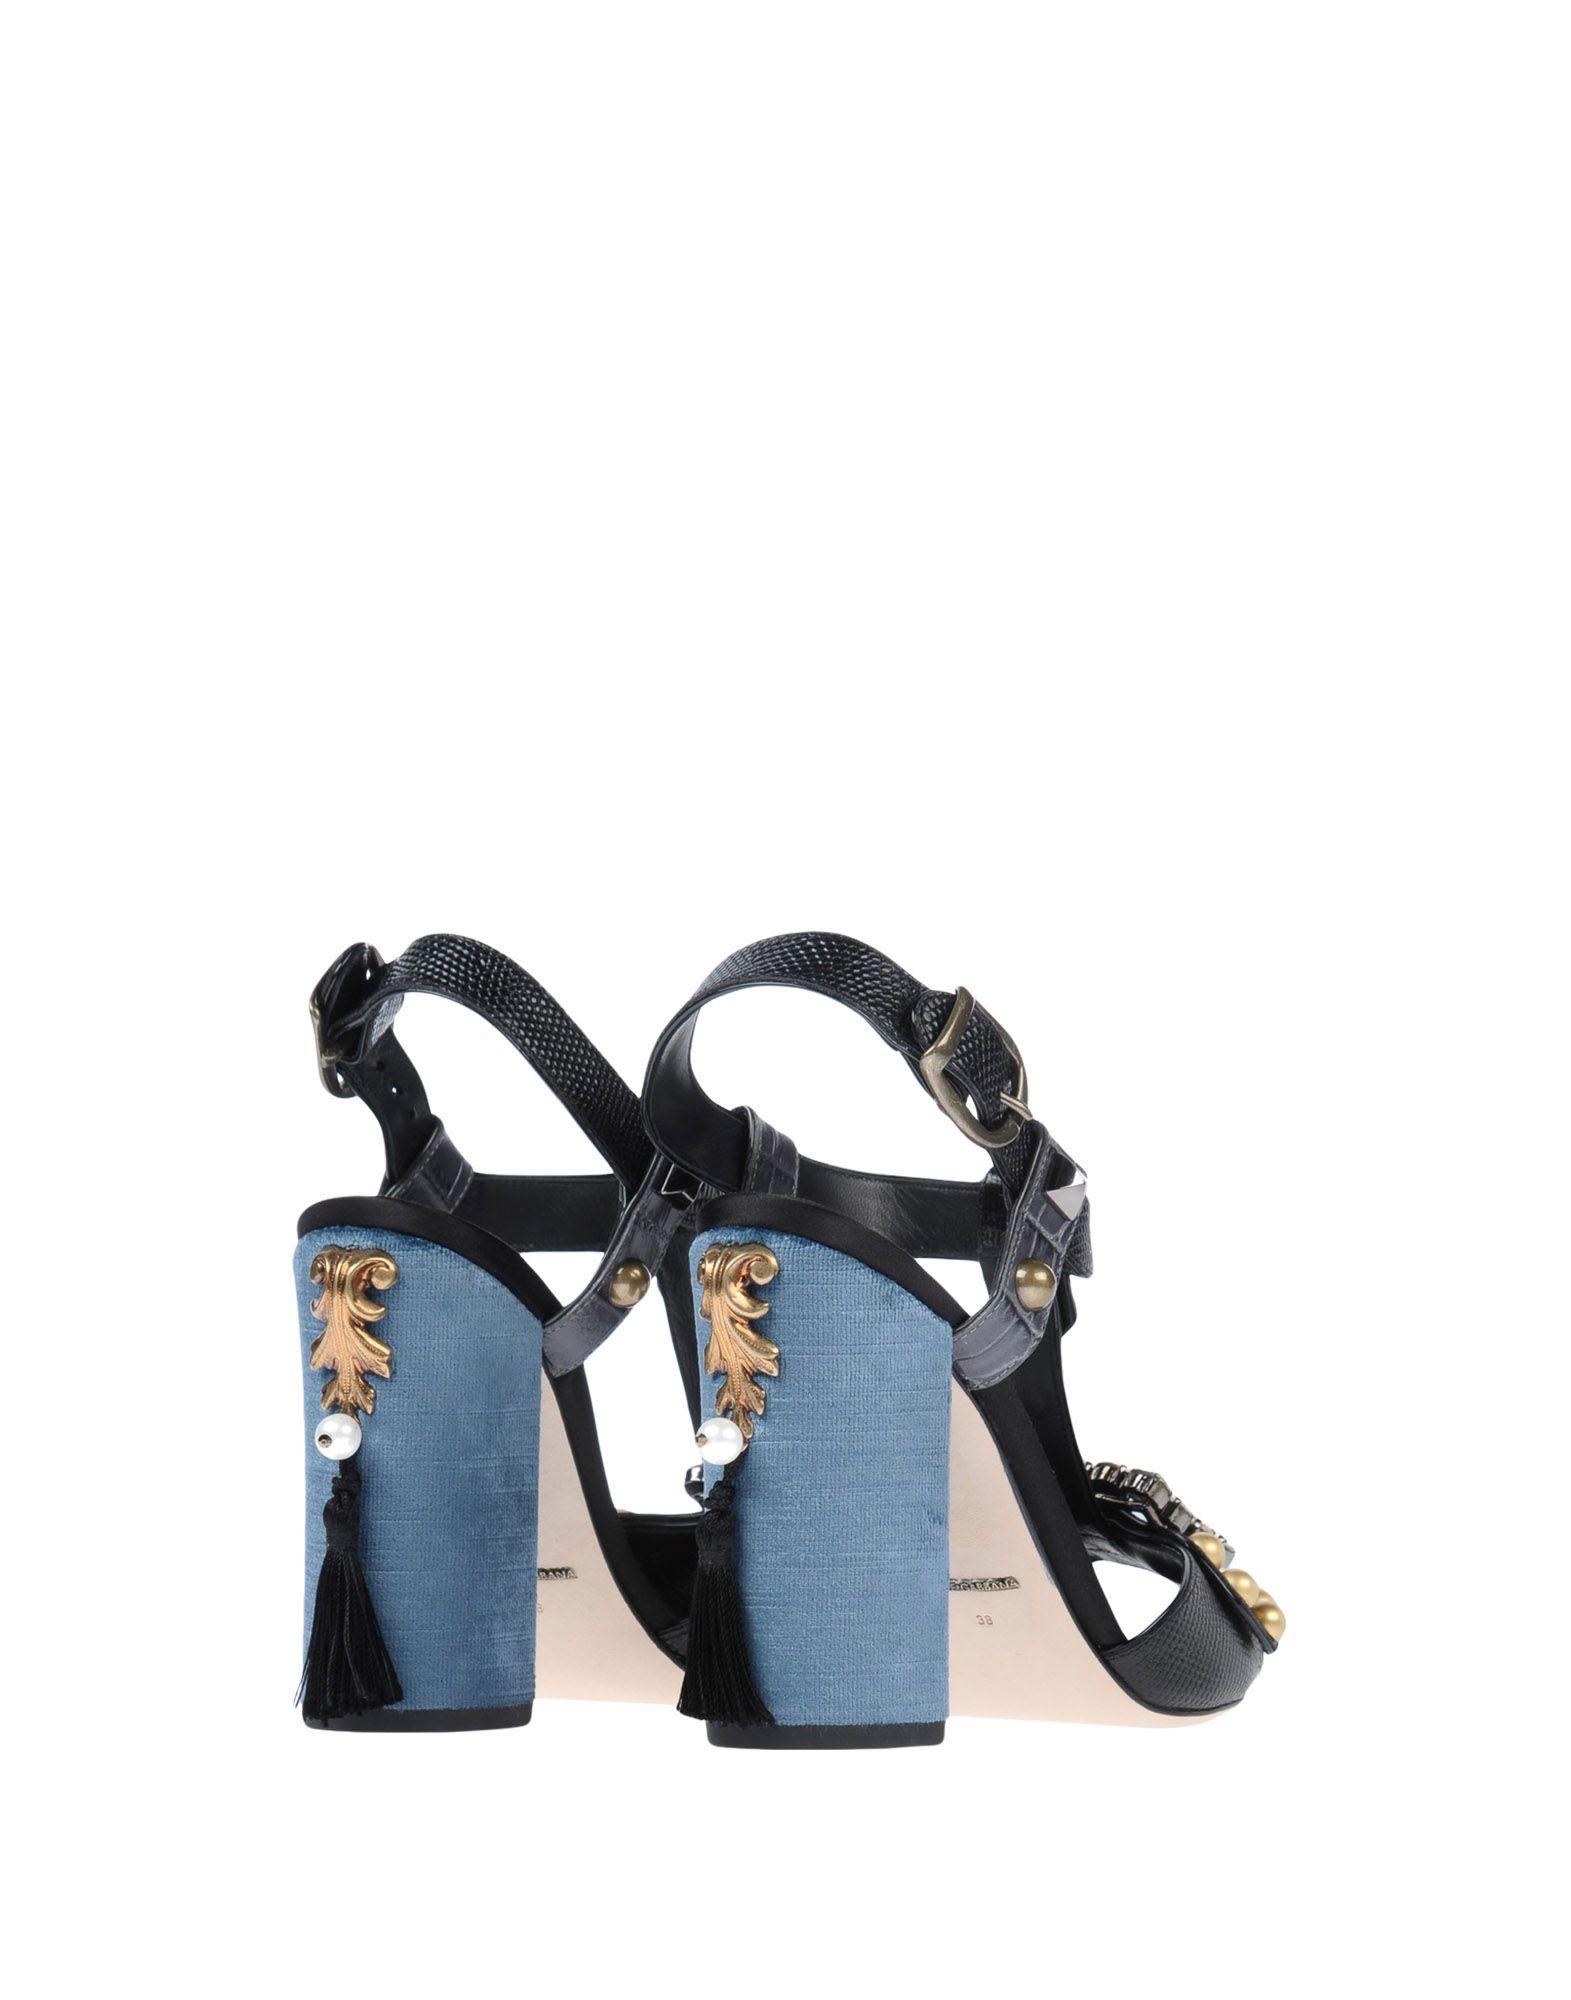 Dolce & Gabbana Sandals - Women Dolce & Gabbana Sandals Sandals Sandals online on  United Kingdom - 11488491OO ebe27b